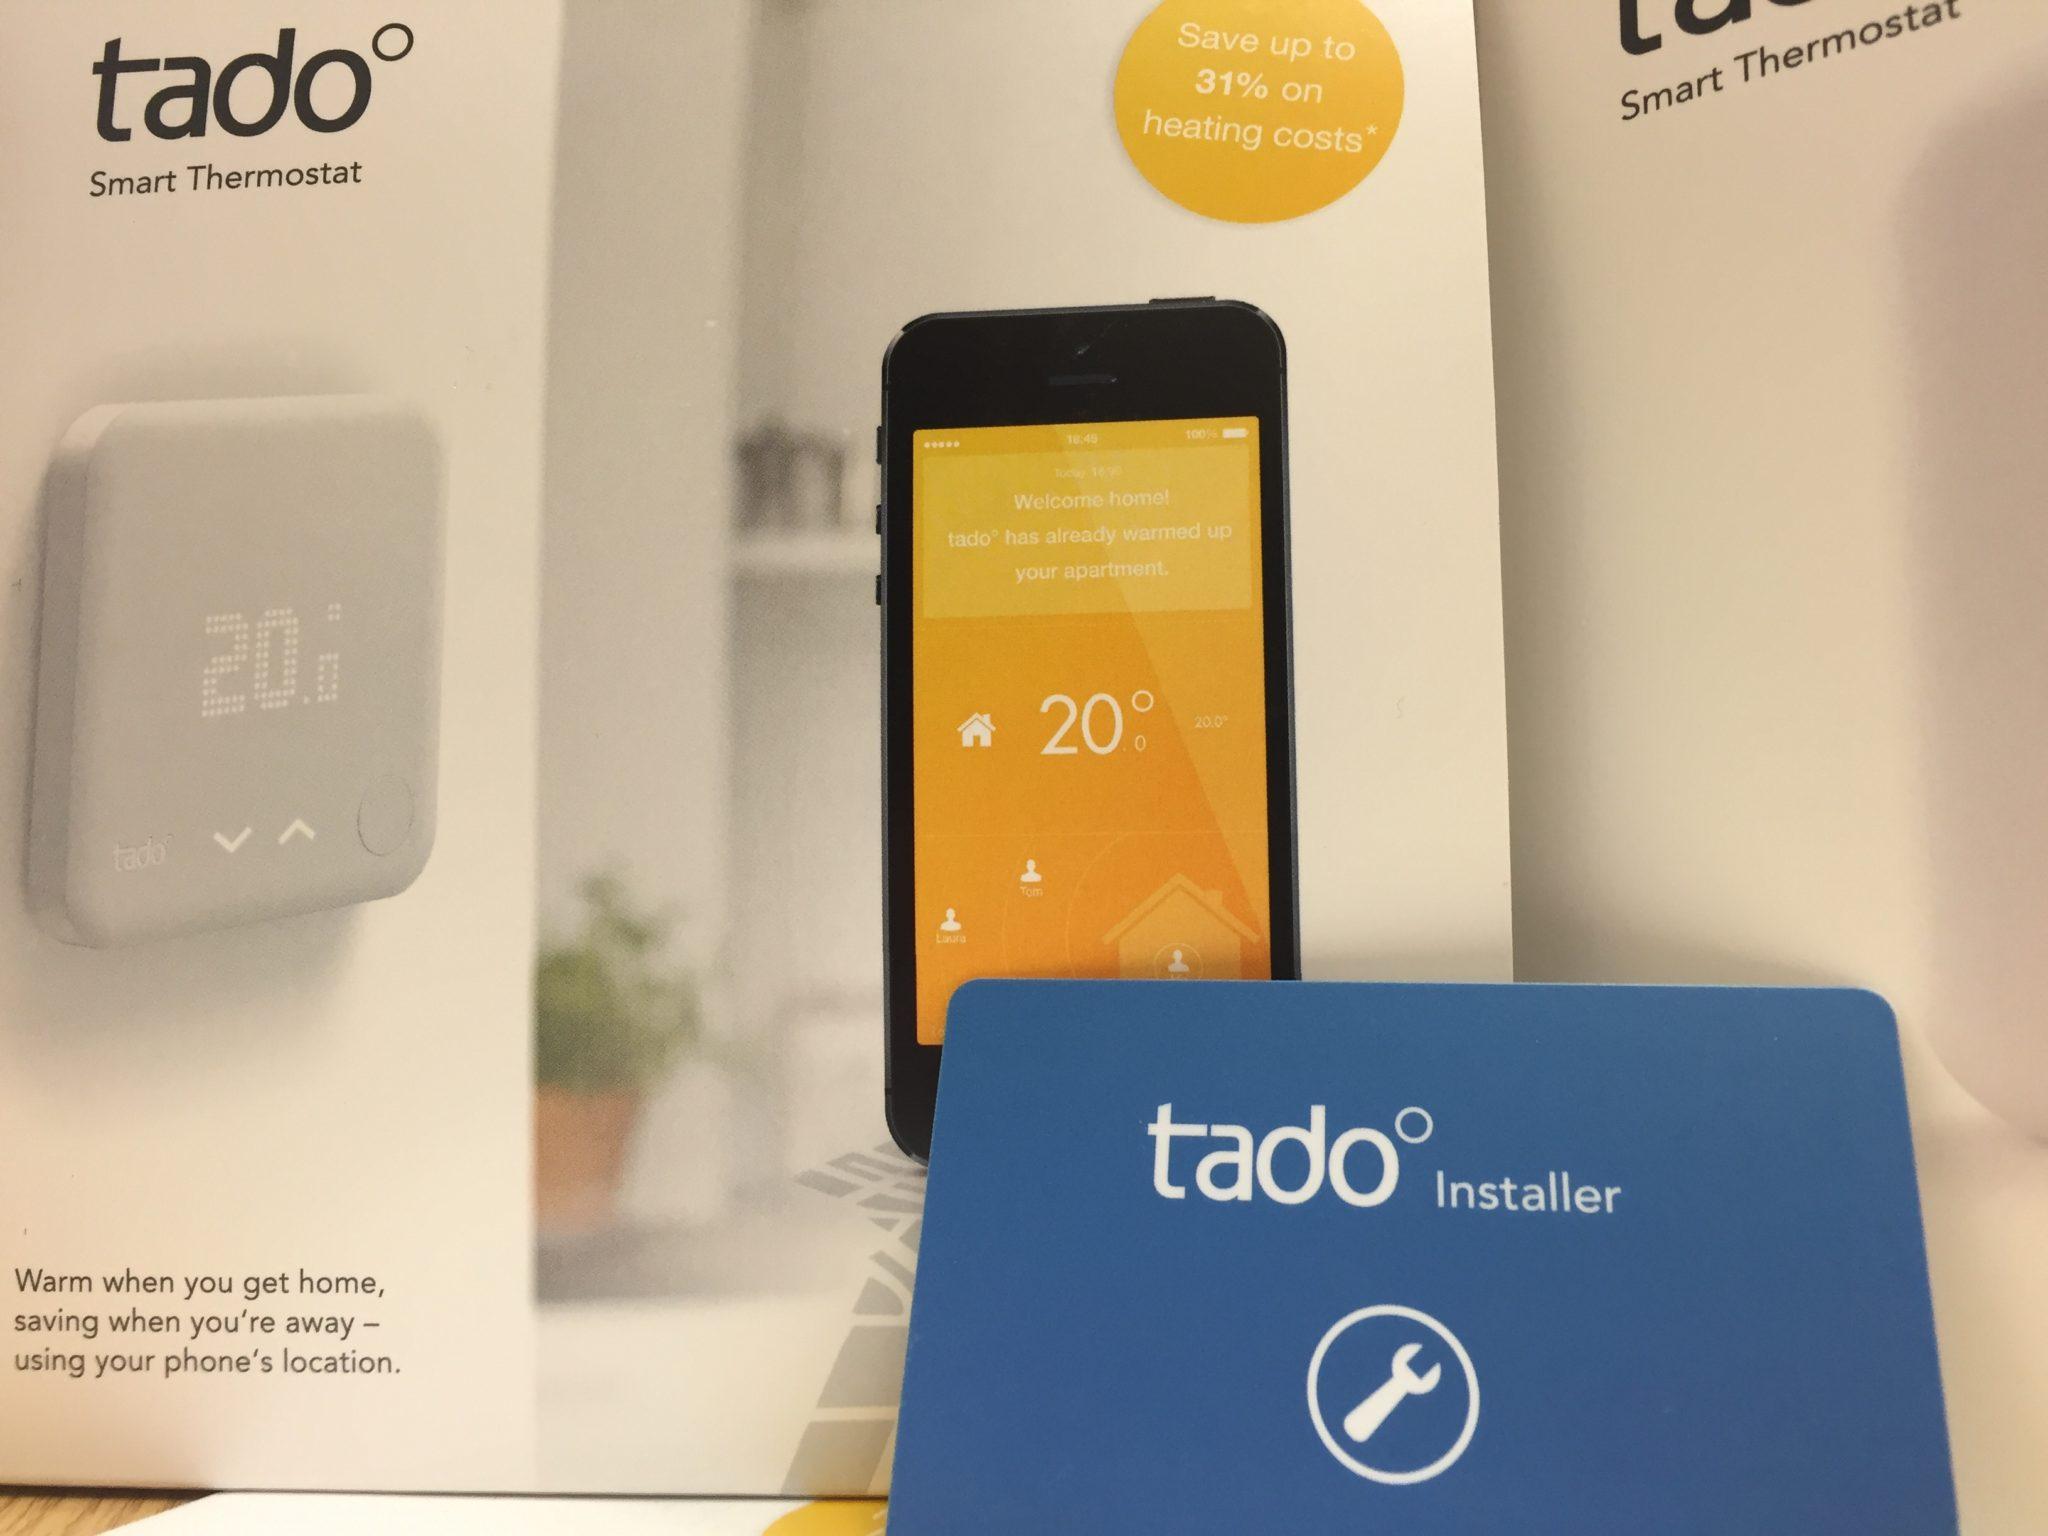 A tado° Smart Thermostat installation